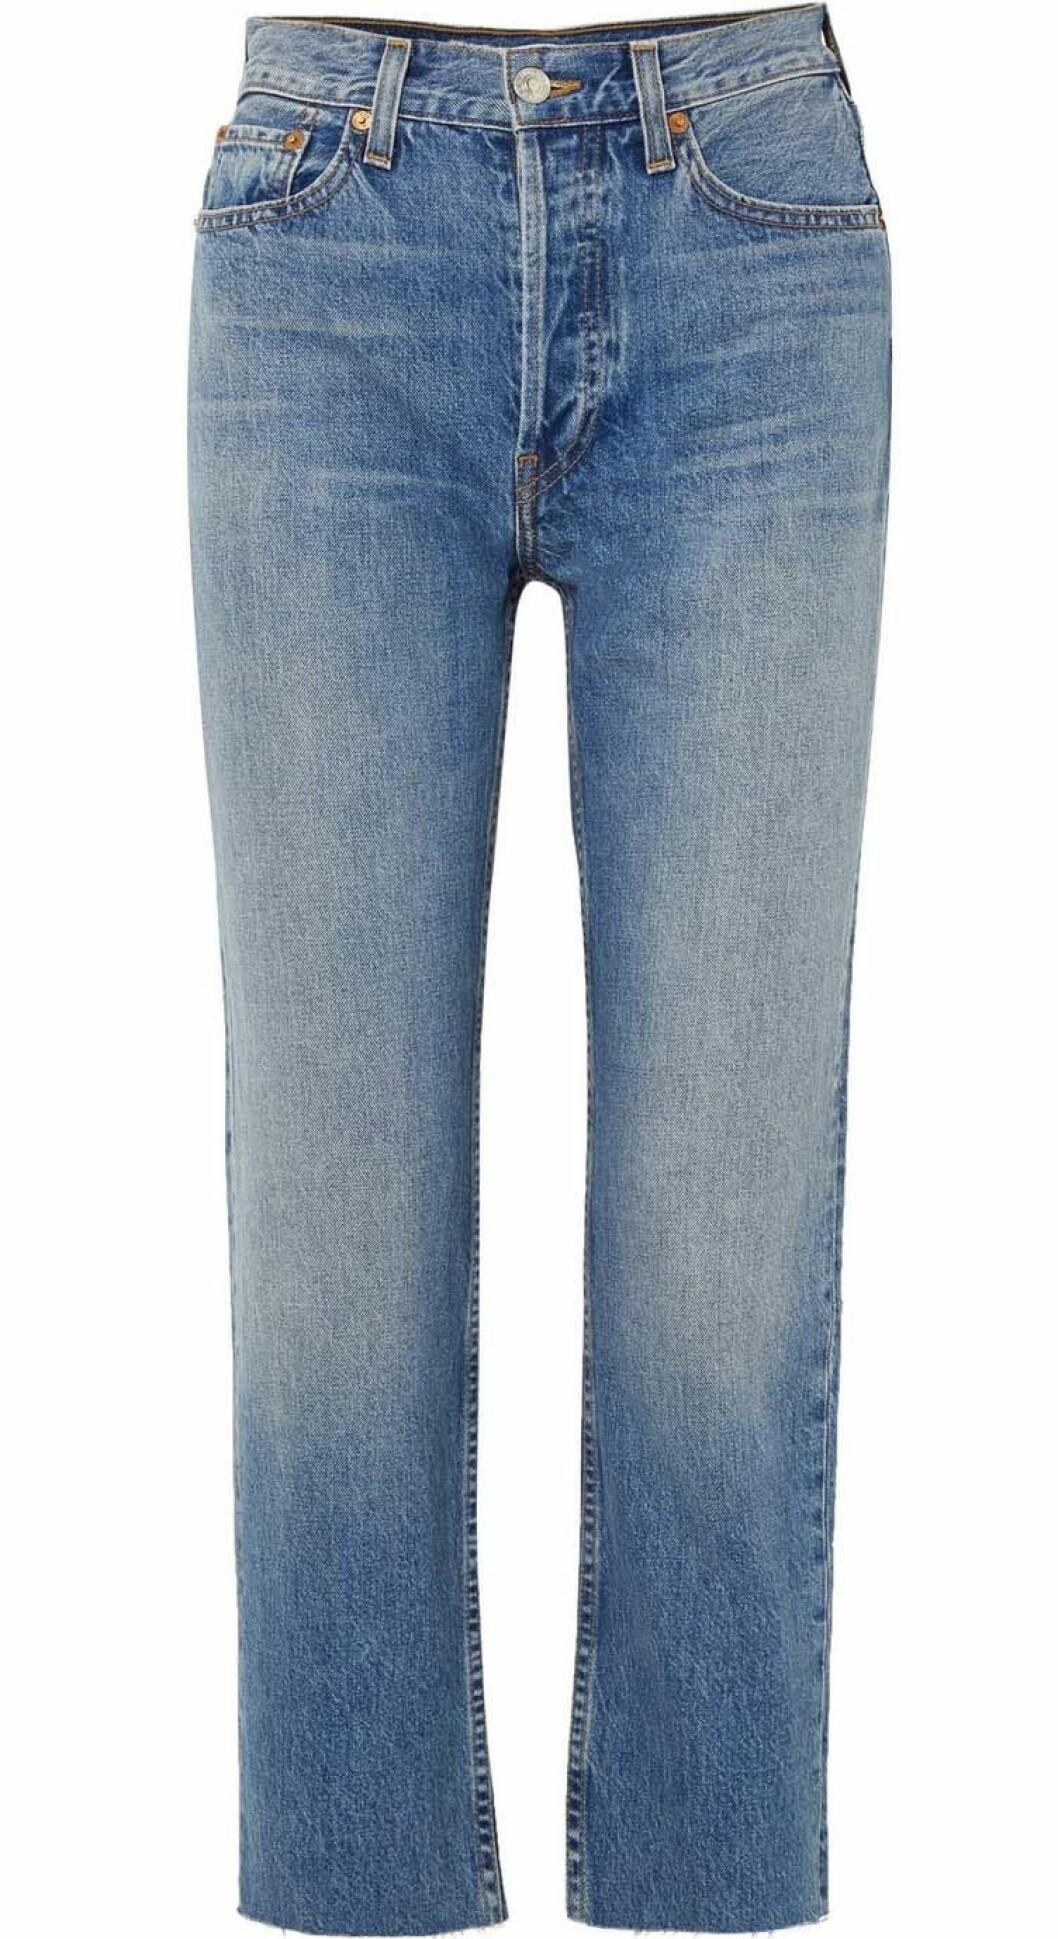 ljusa-re-done-denim-jeans-net-a-porter